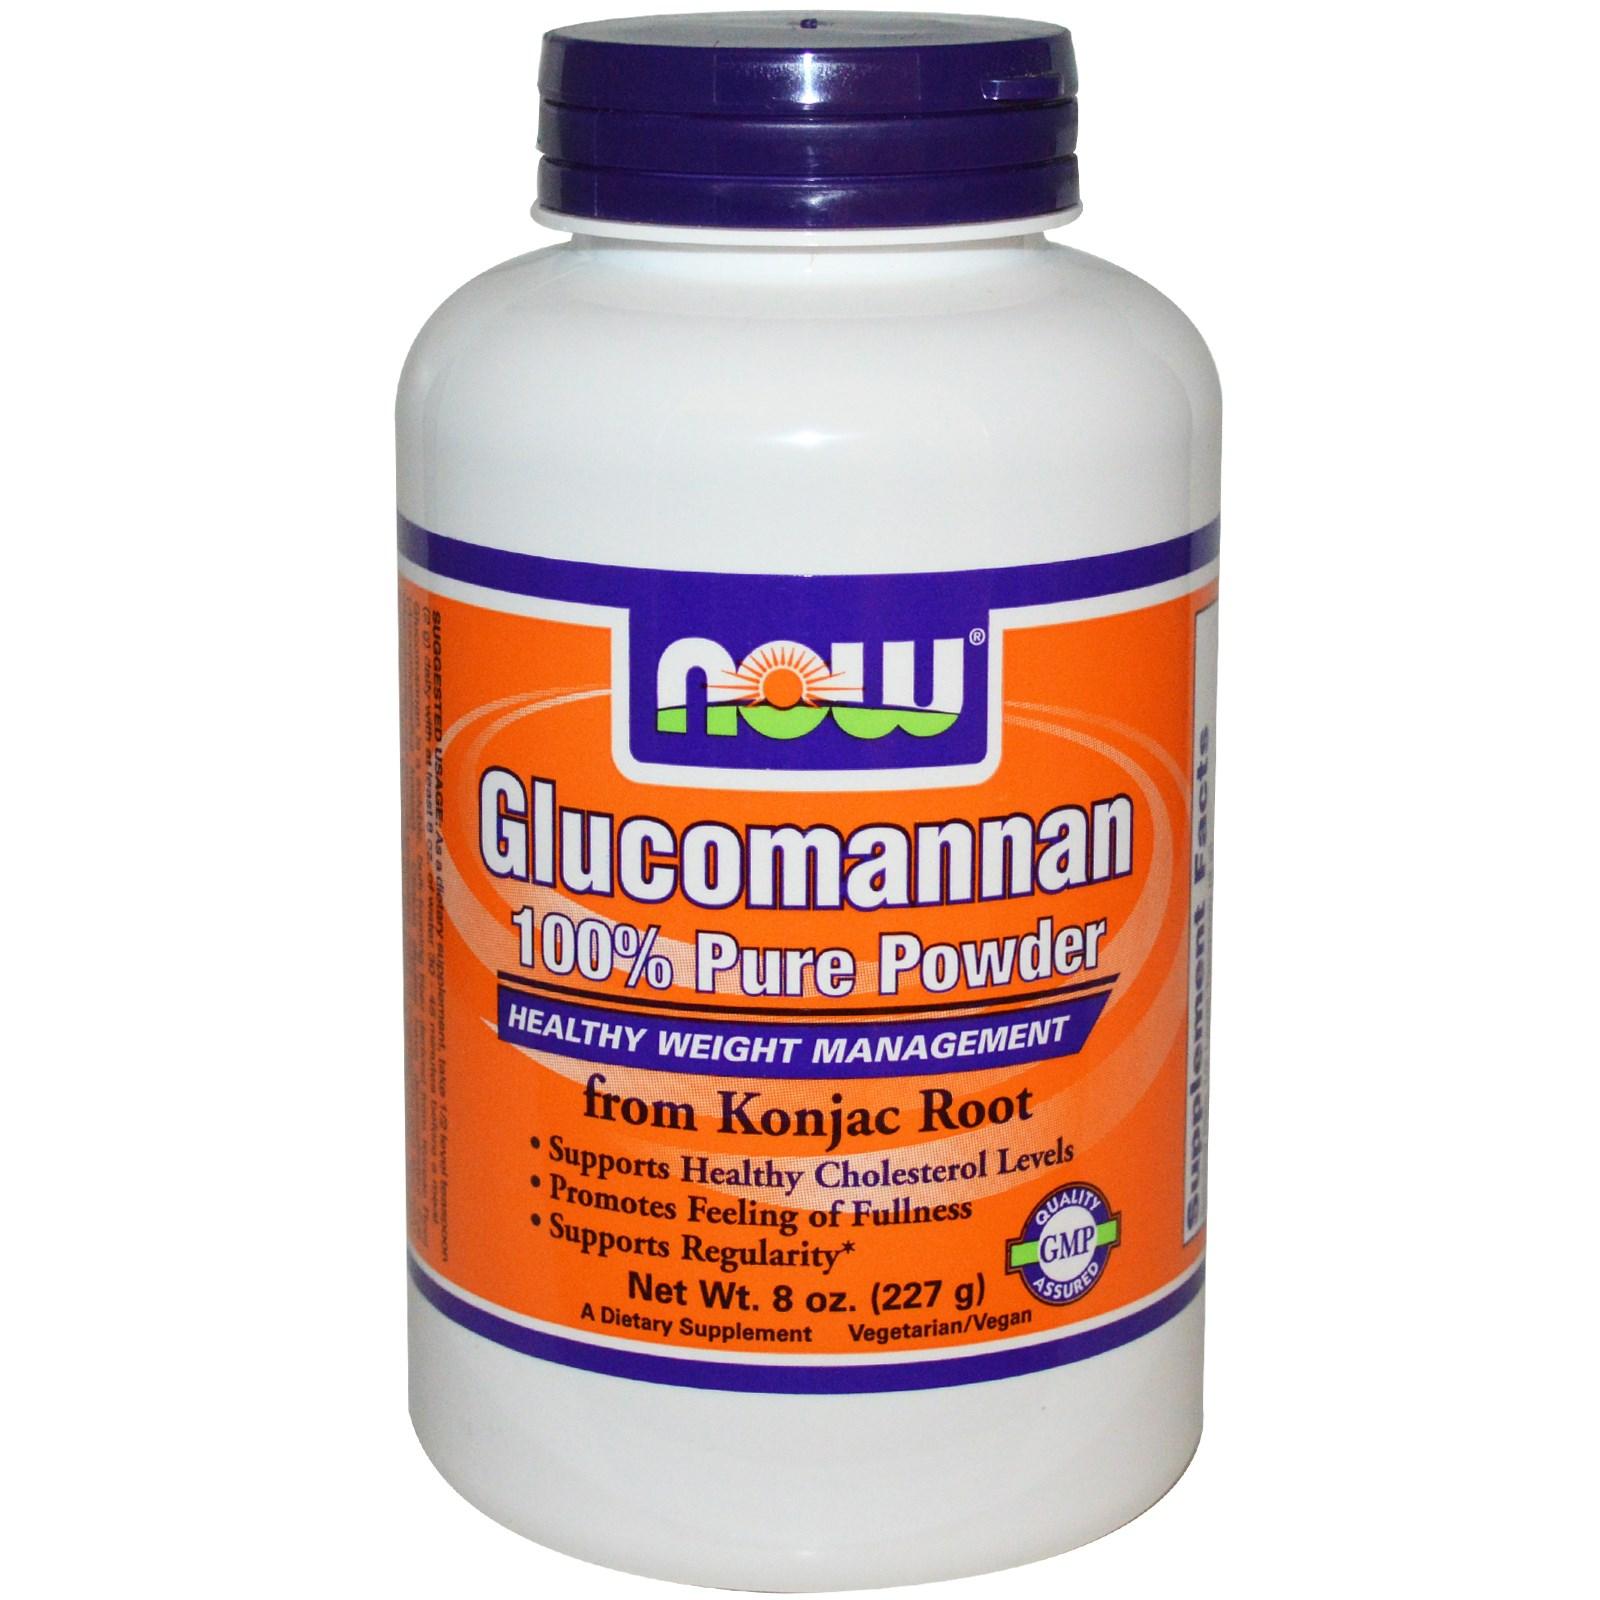 NOW Glucomannan Pure Powder